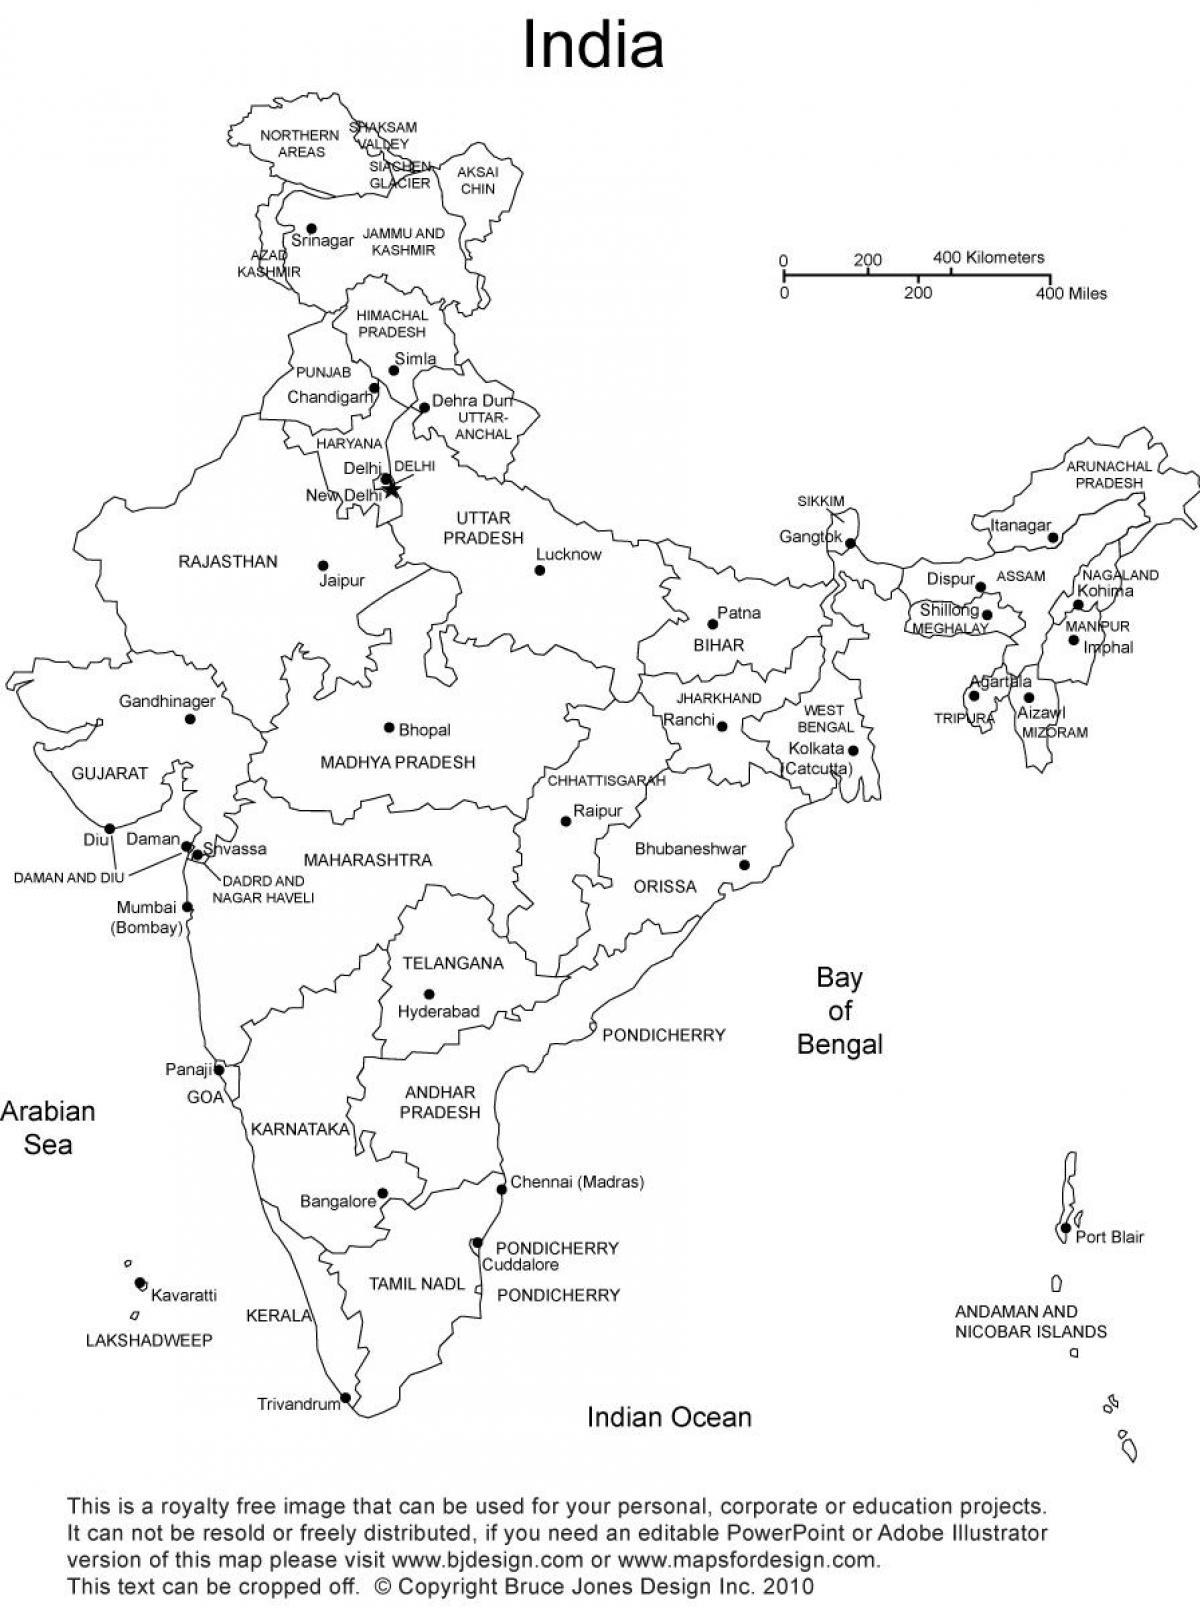 Indie Mapa Se Staty Blank Slepa Mapa Indie Se Staty Jizni Asie